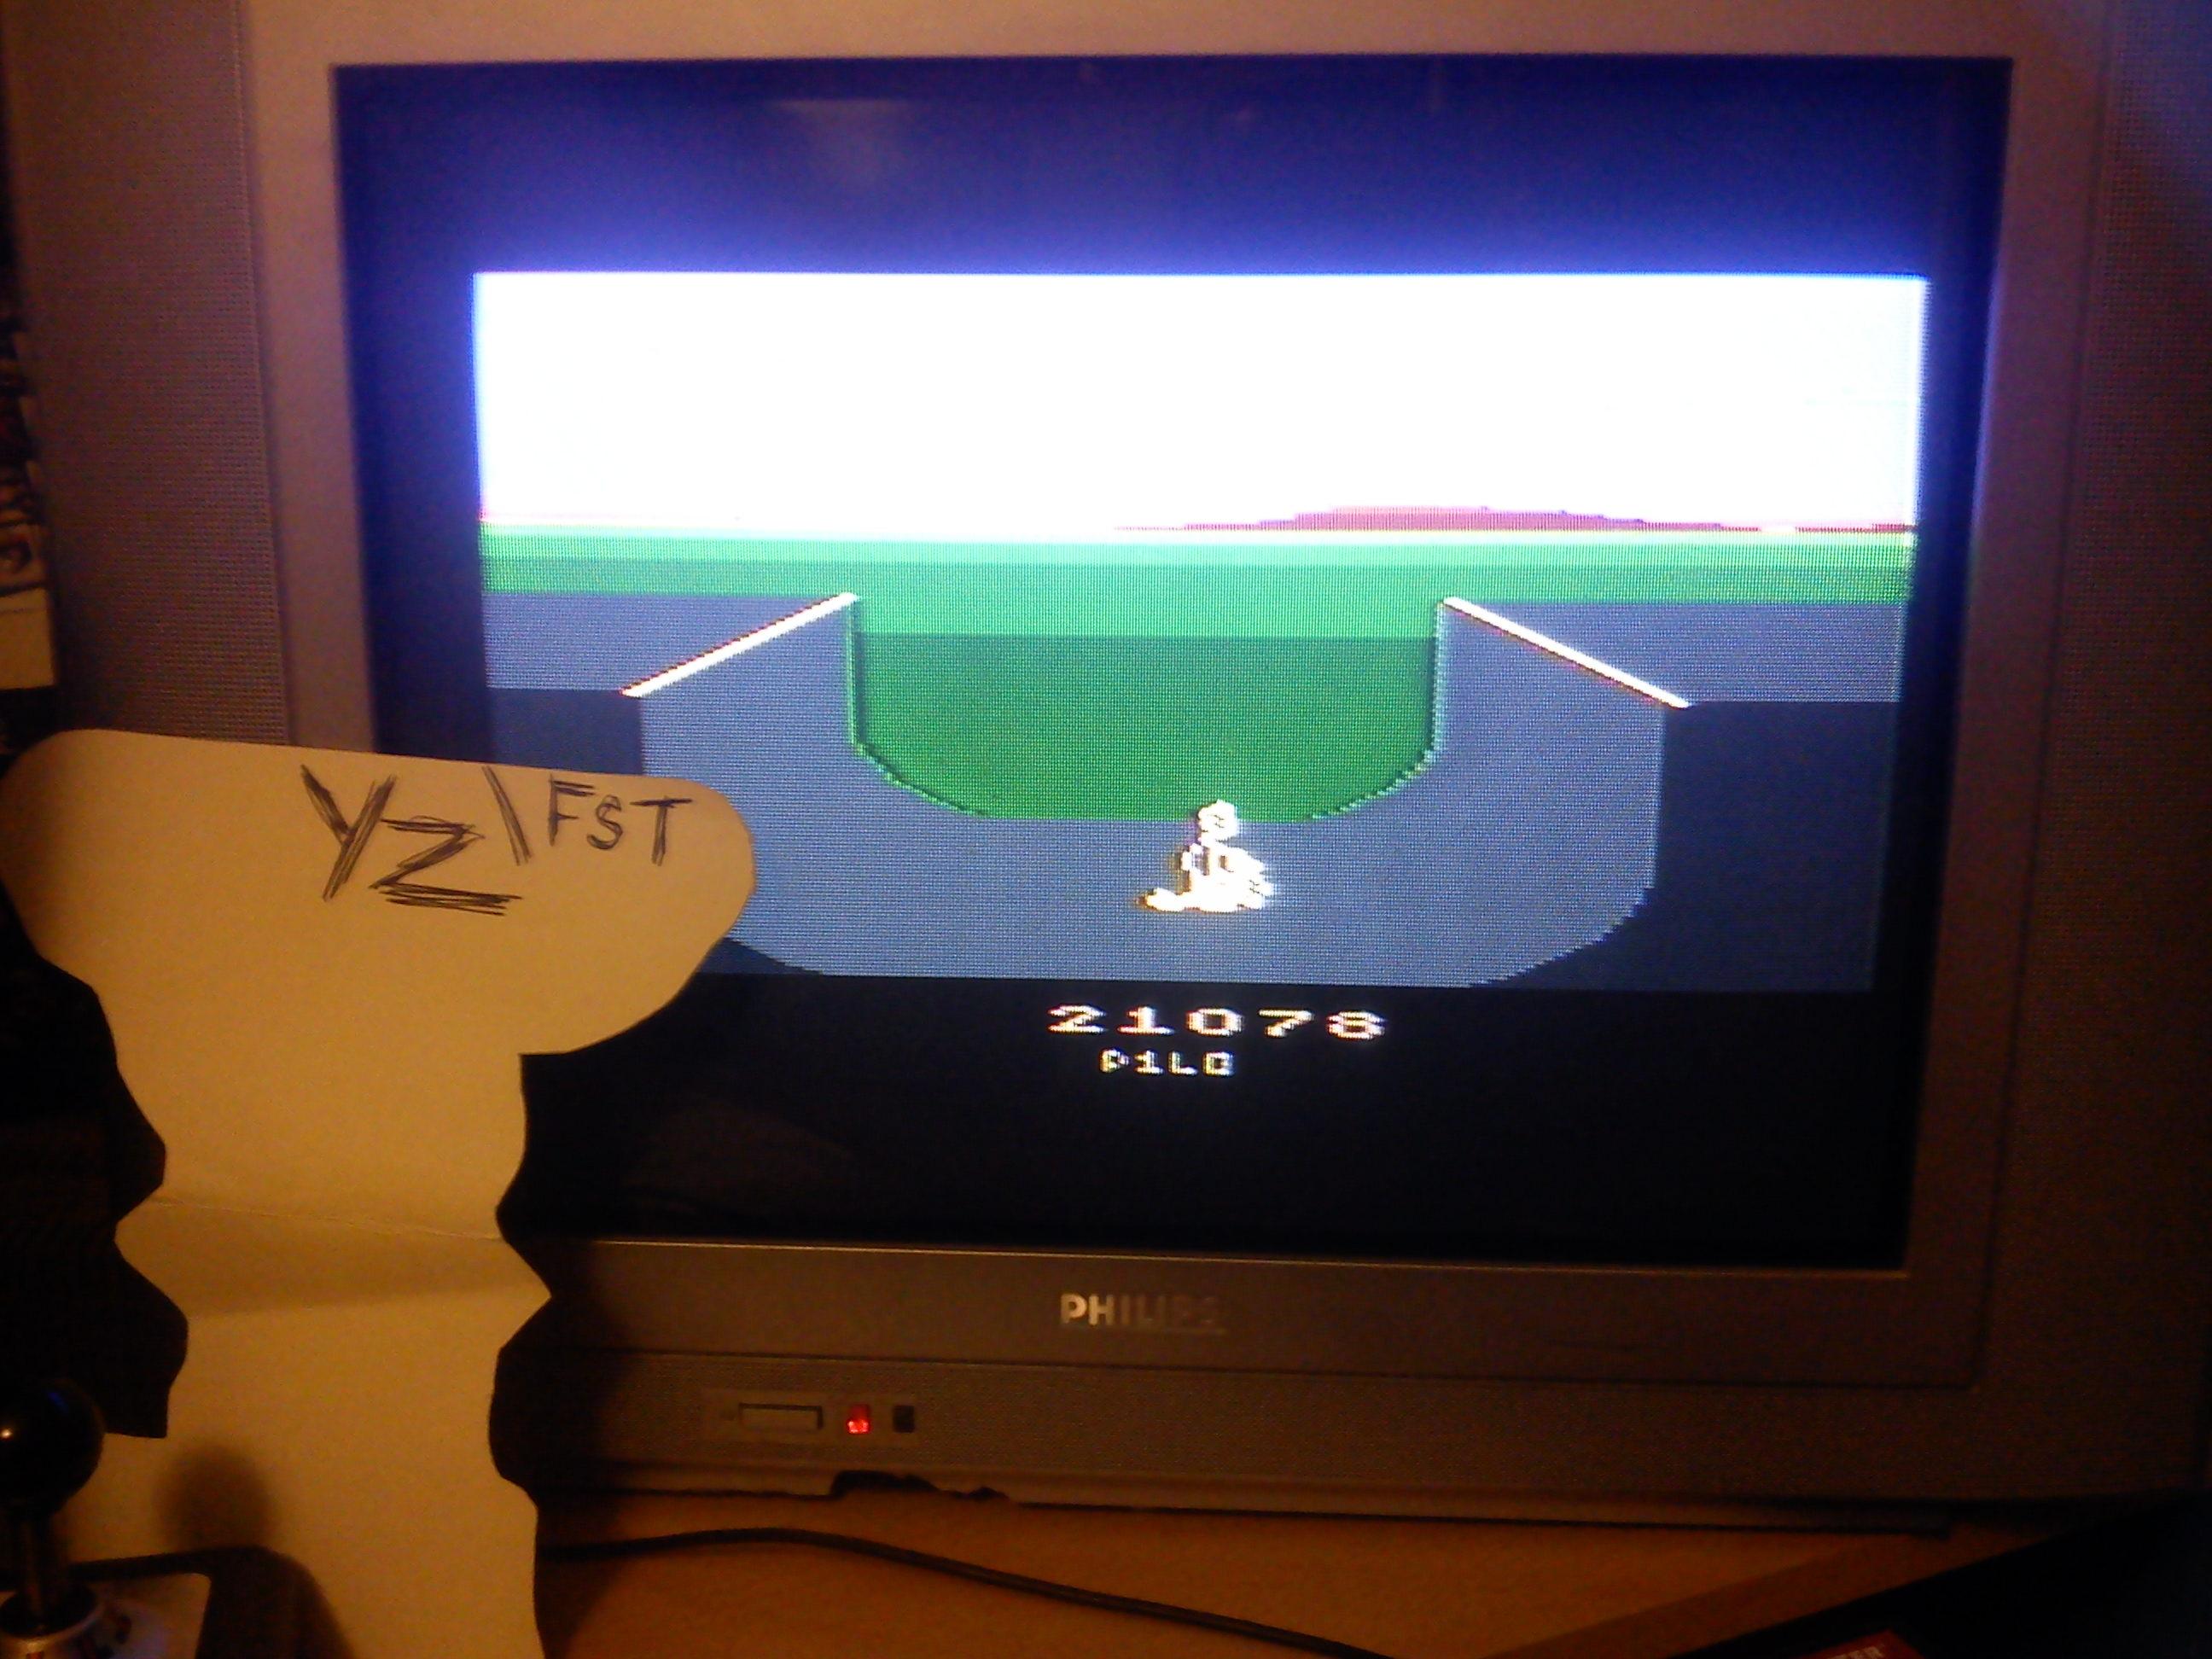 Fr0st: BMX Airmaster: Arcade Mode (Atari 2600) 21,078 points on 2014-06-03 15:37:24